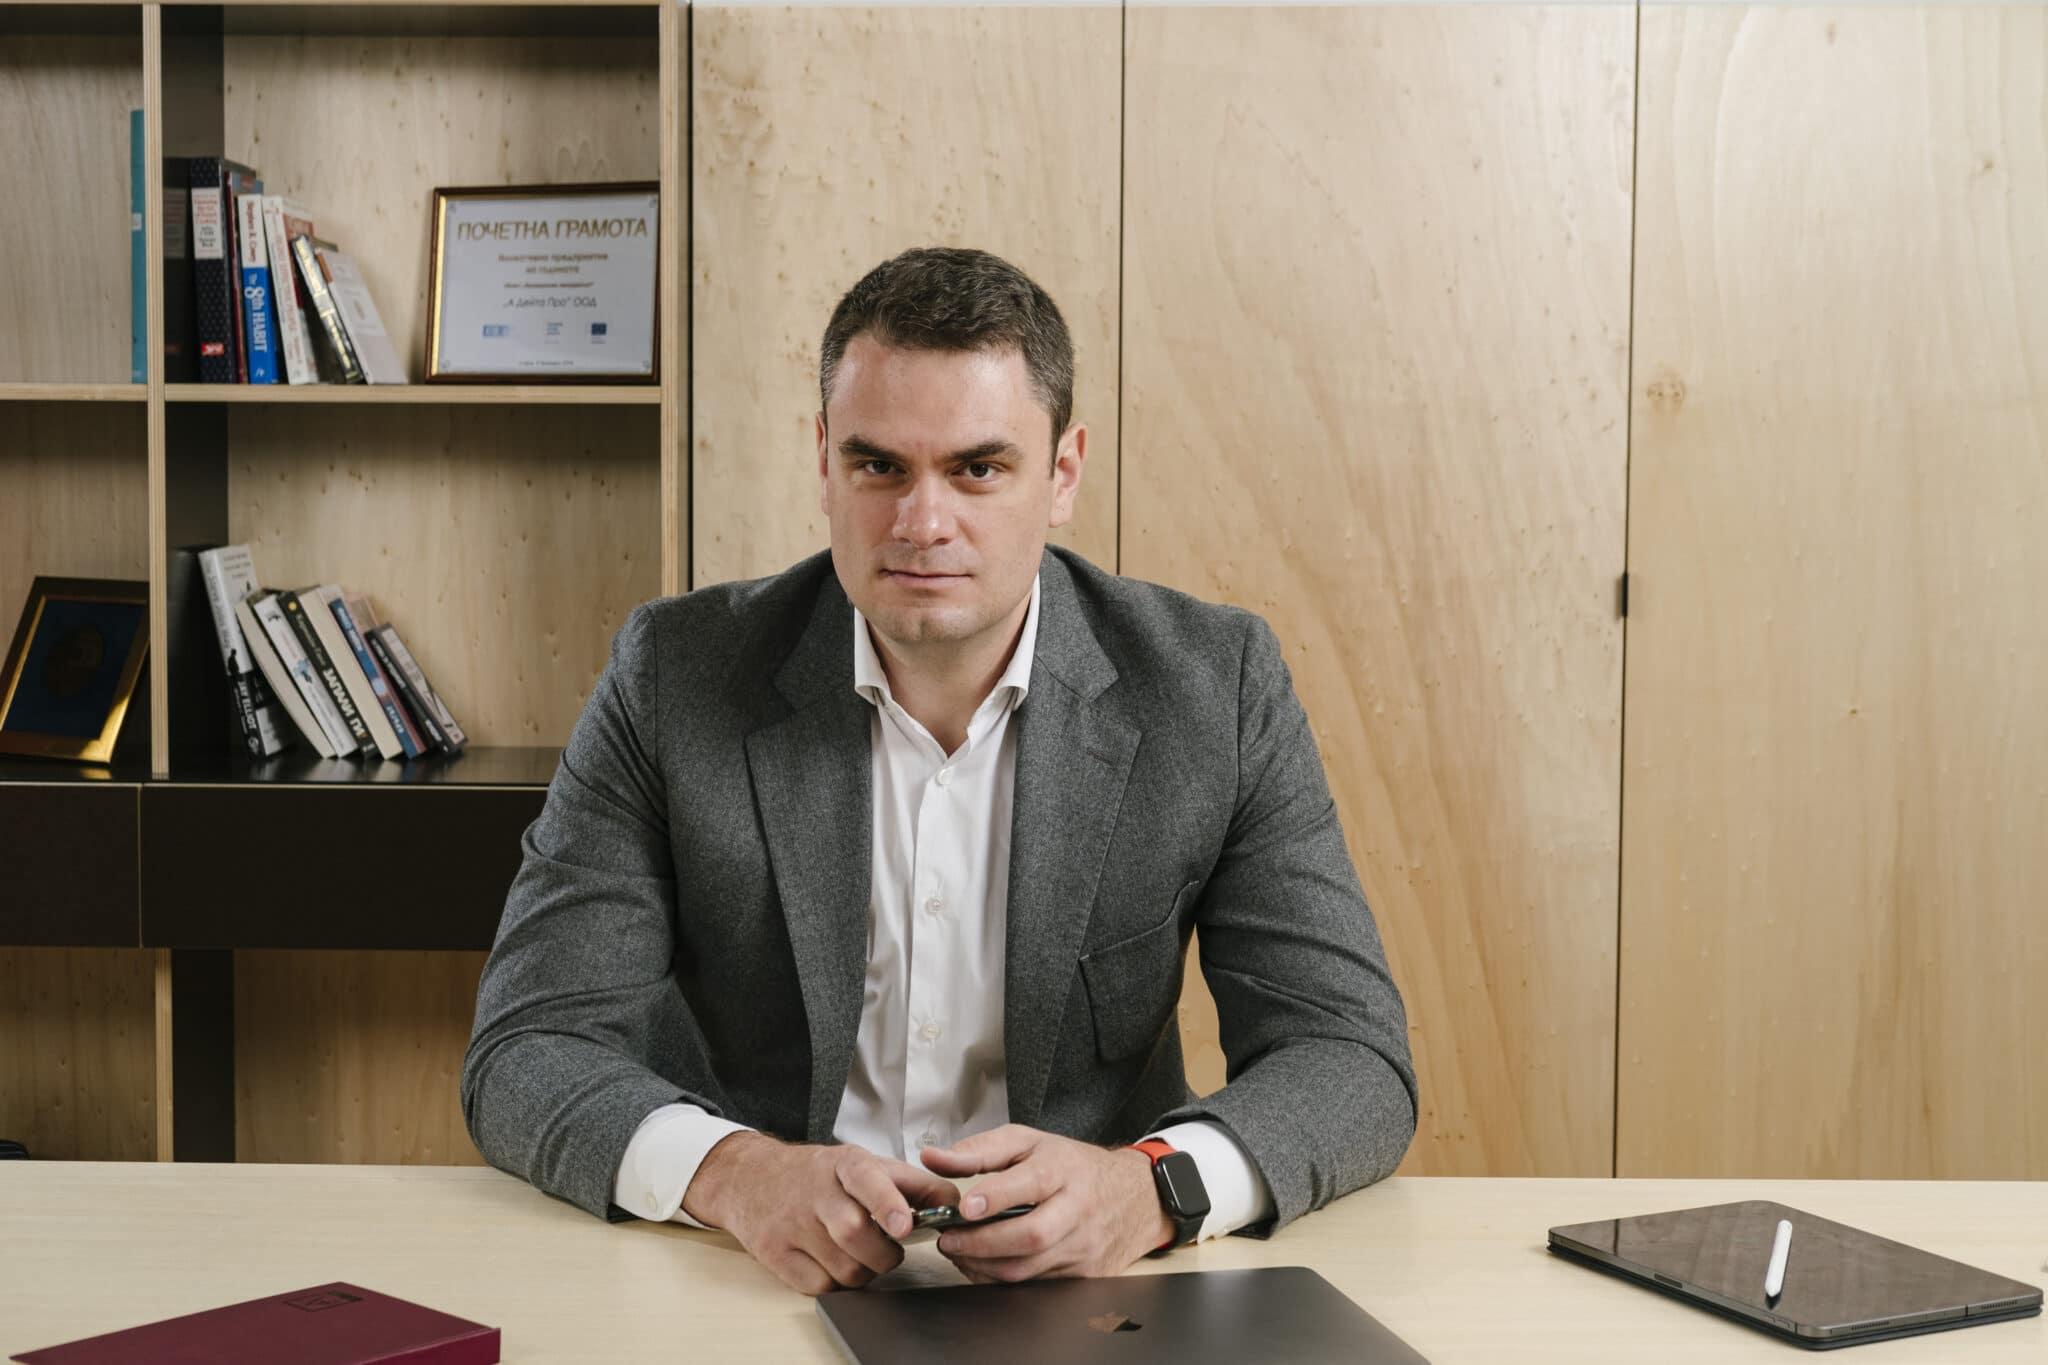 Ilia Krustev A Data Pro